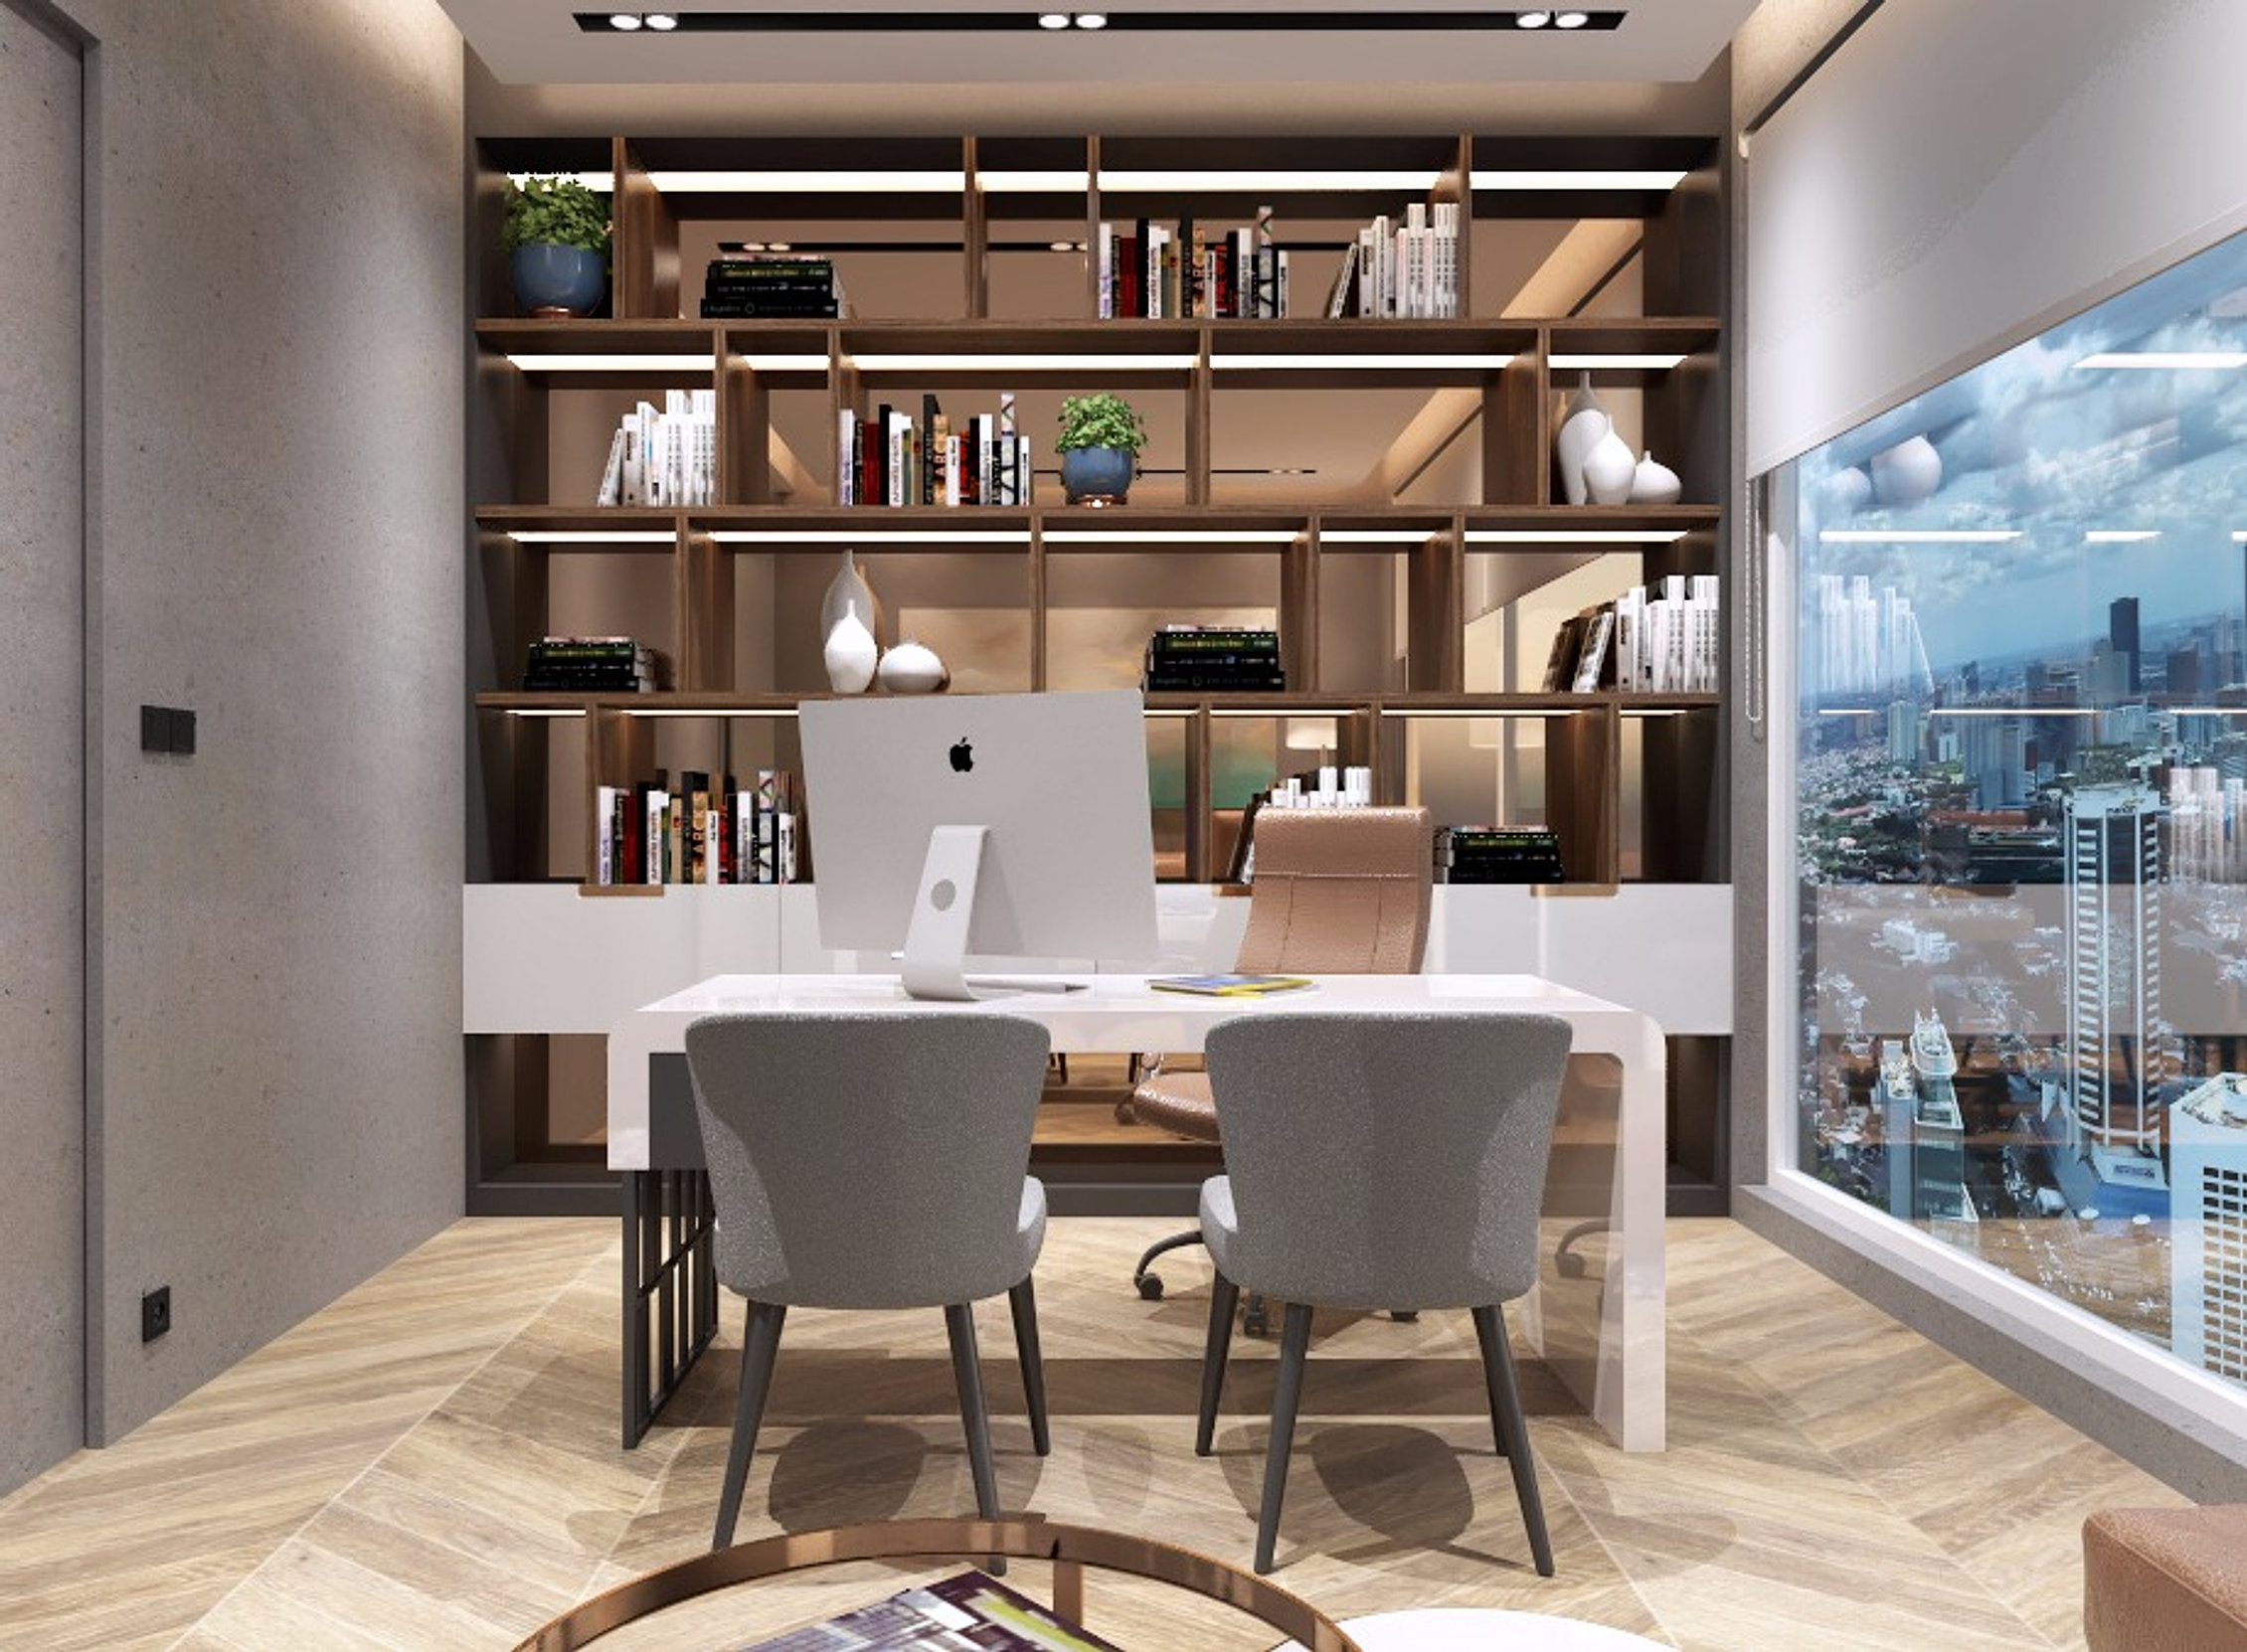 Ciputras ciputras stresa stresa modern dining room modern dining room restaurant design and build mimo home interior